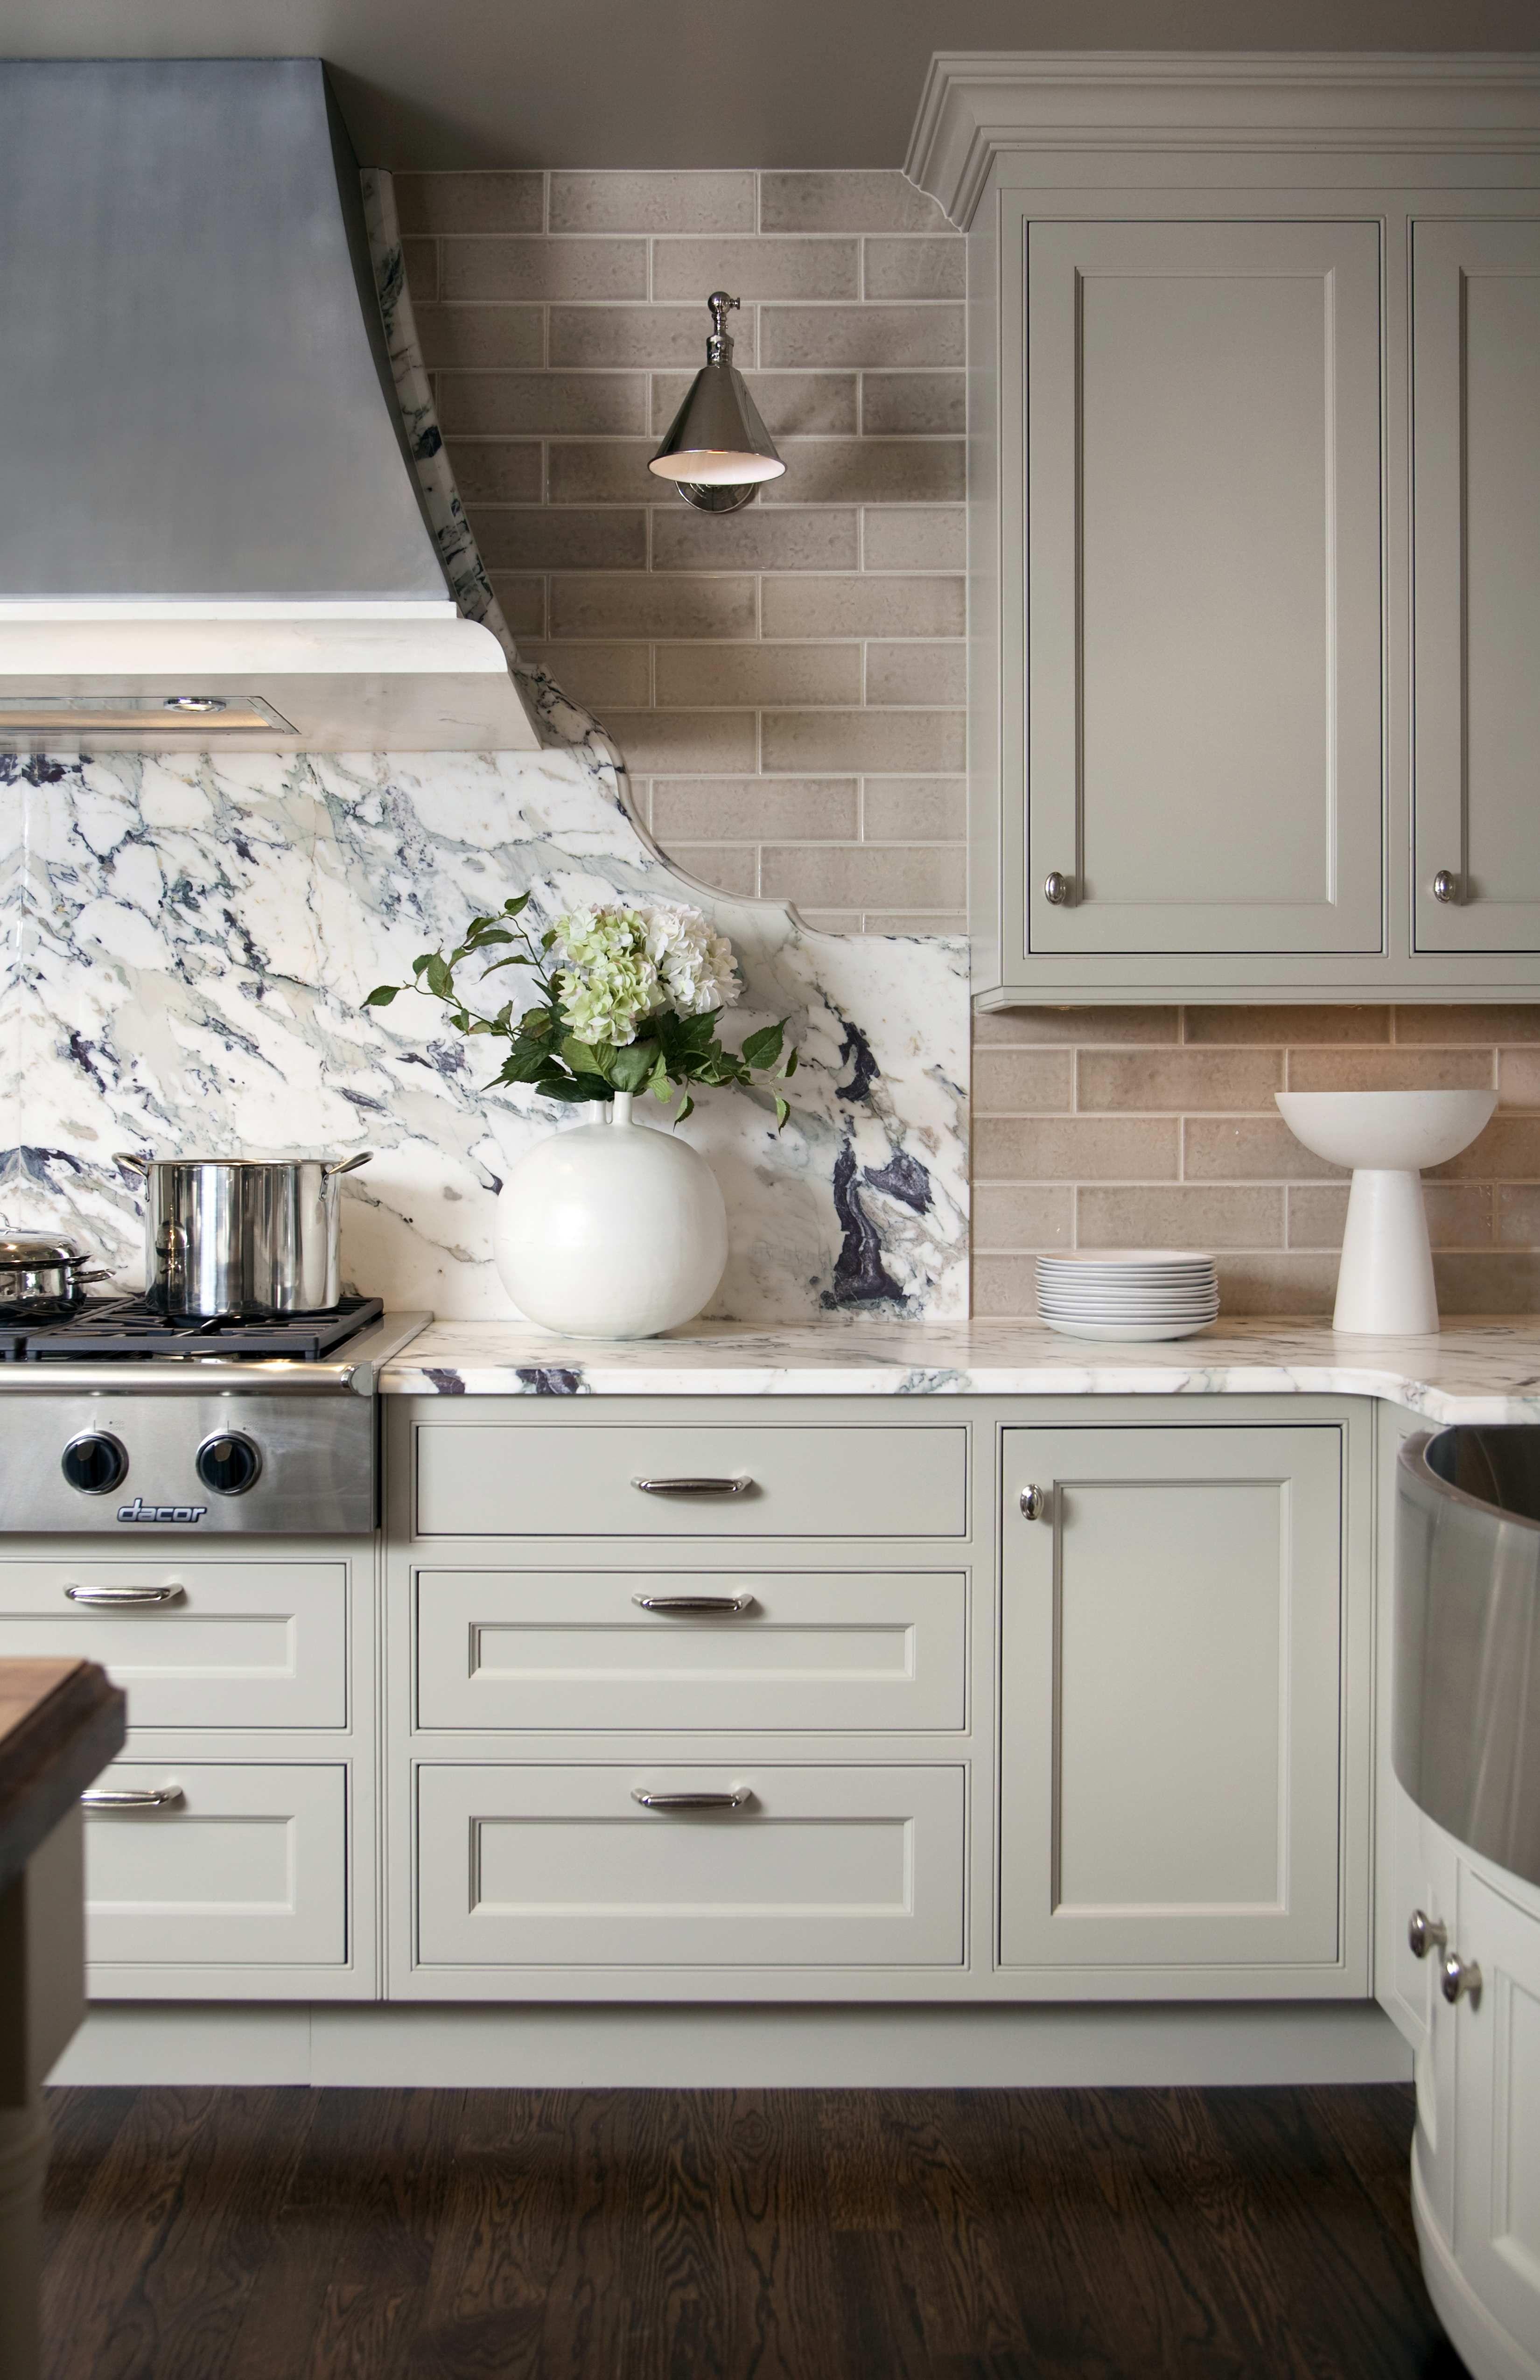 pretty marble meets tile backsplash detail